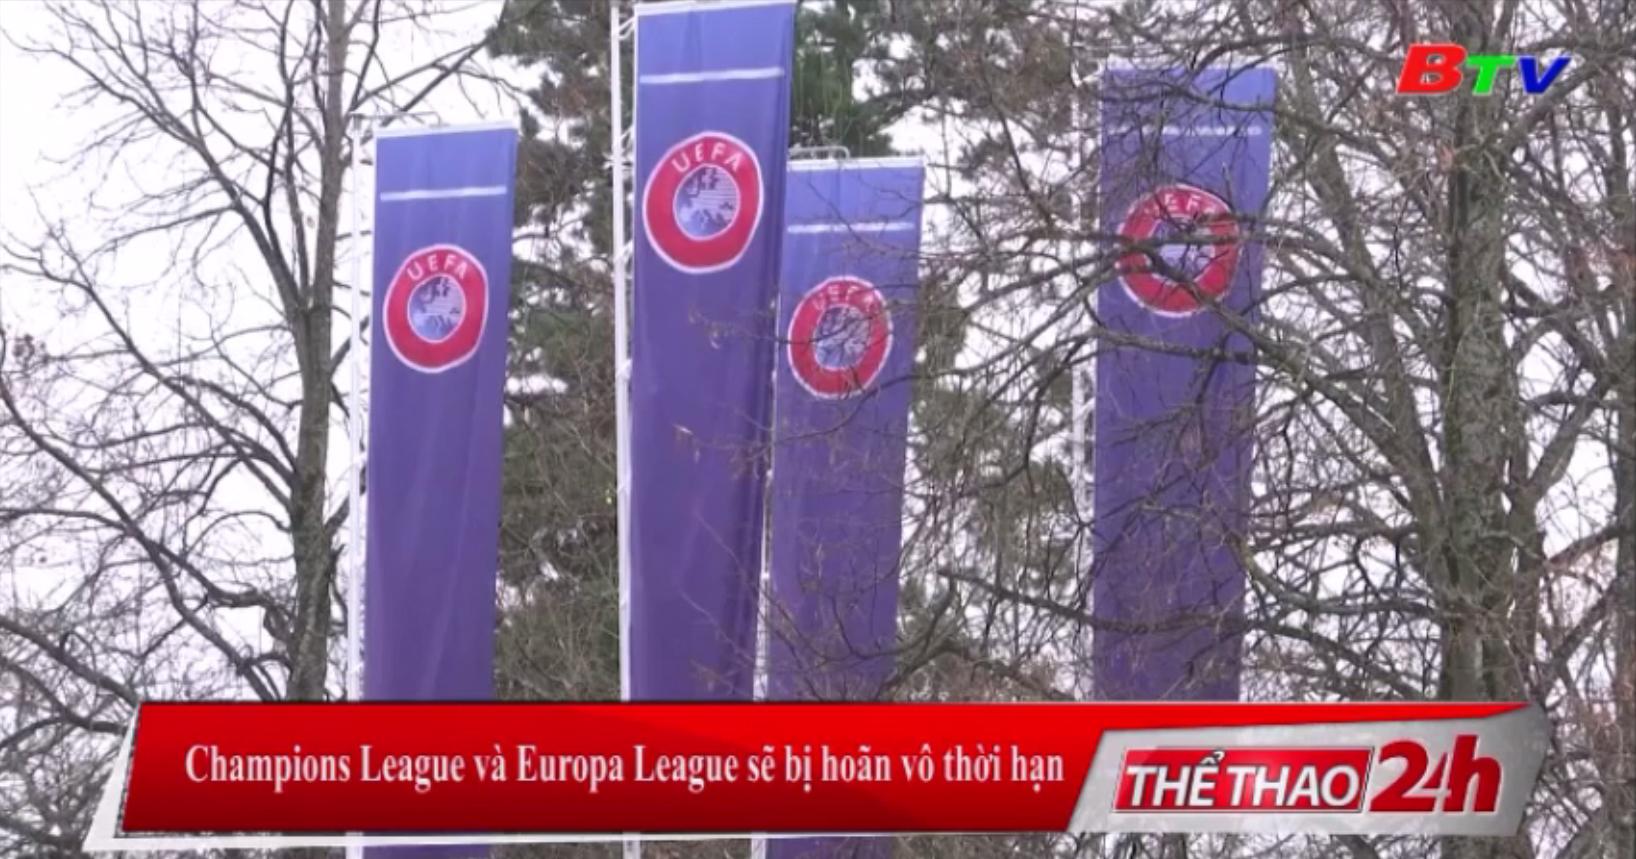 Champions League và Europa League sẽ bị hoãn vô thời hạn